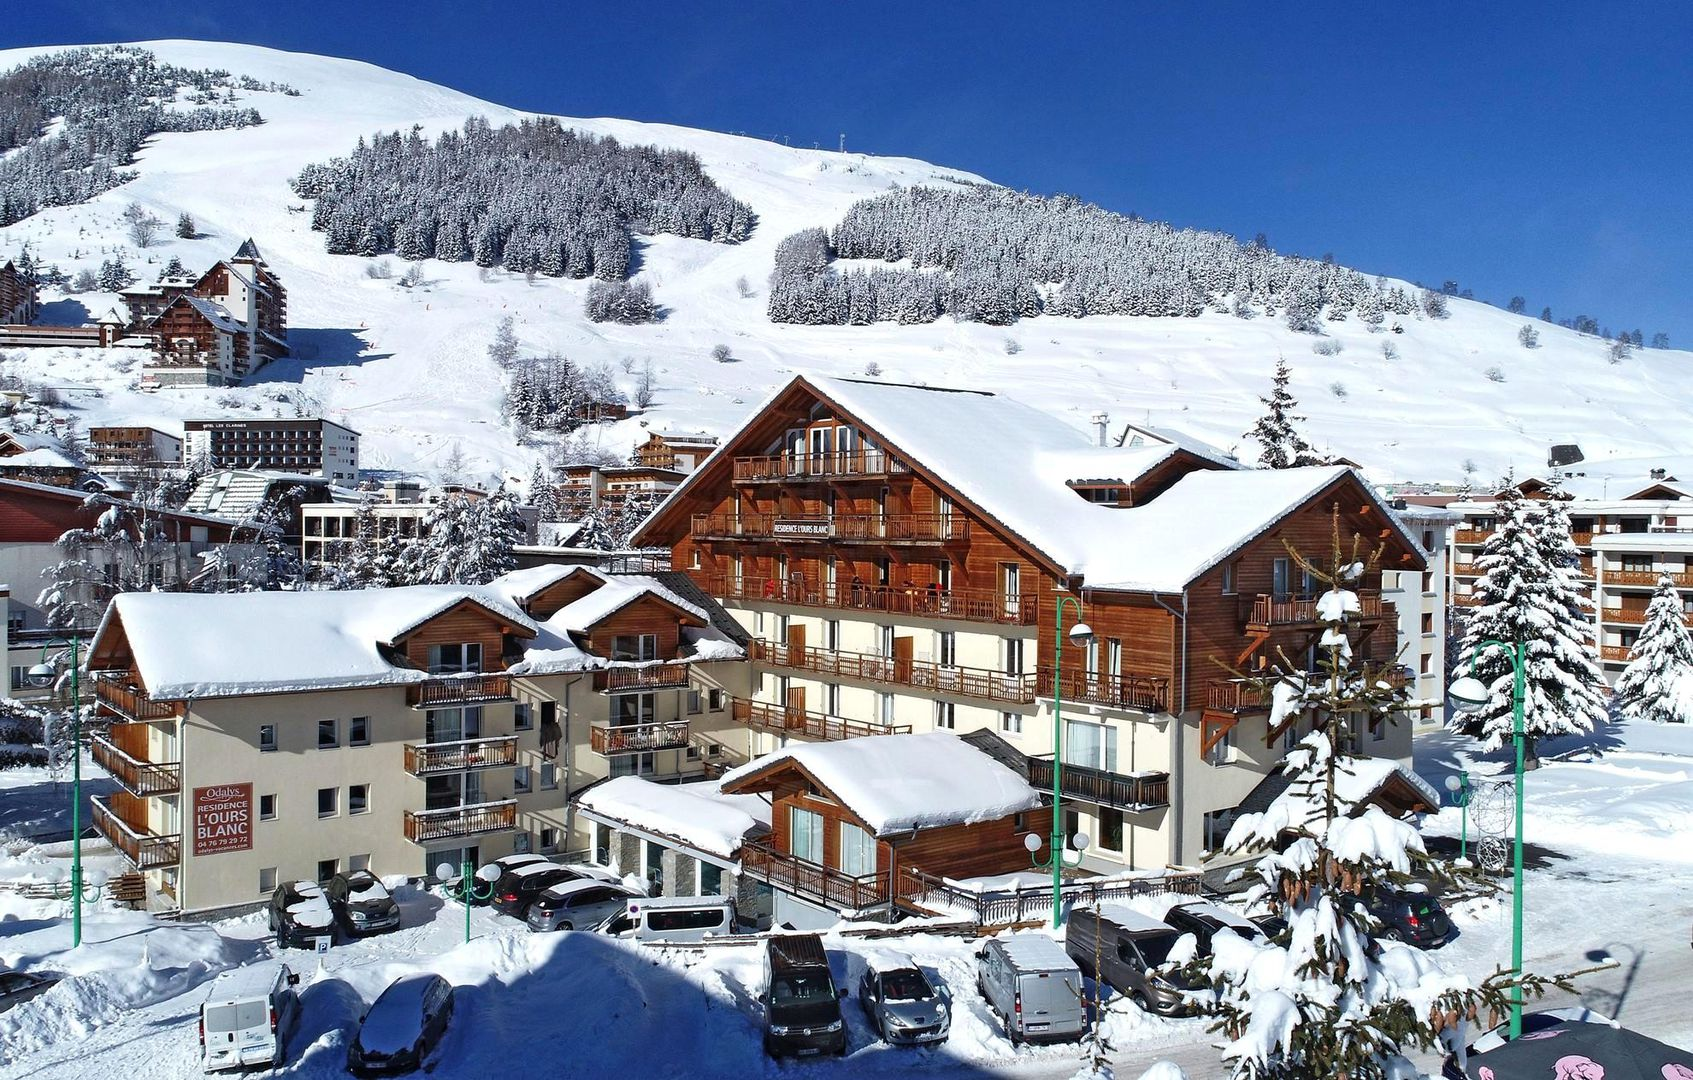 Meer info over Résidence L'Ours Blanc  bij Wintertrex